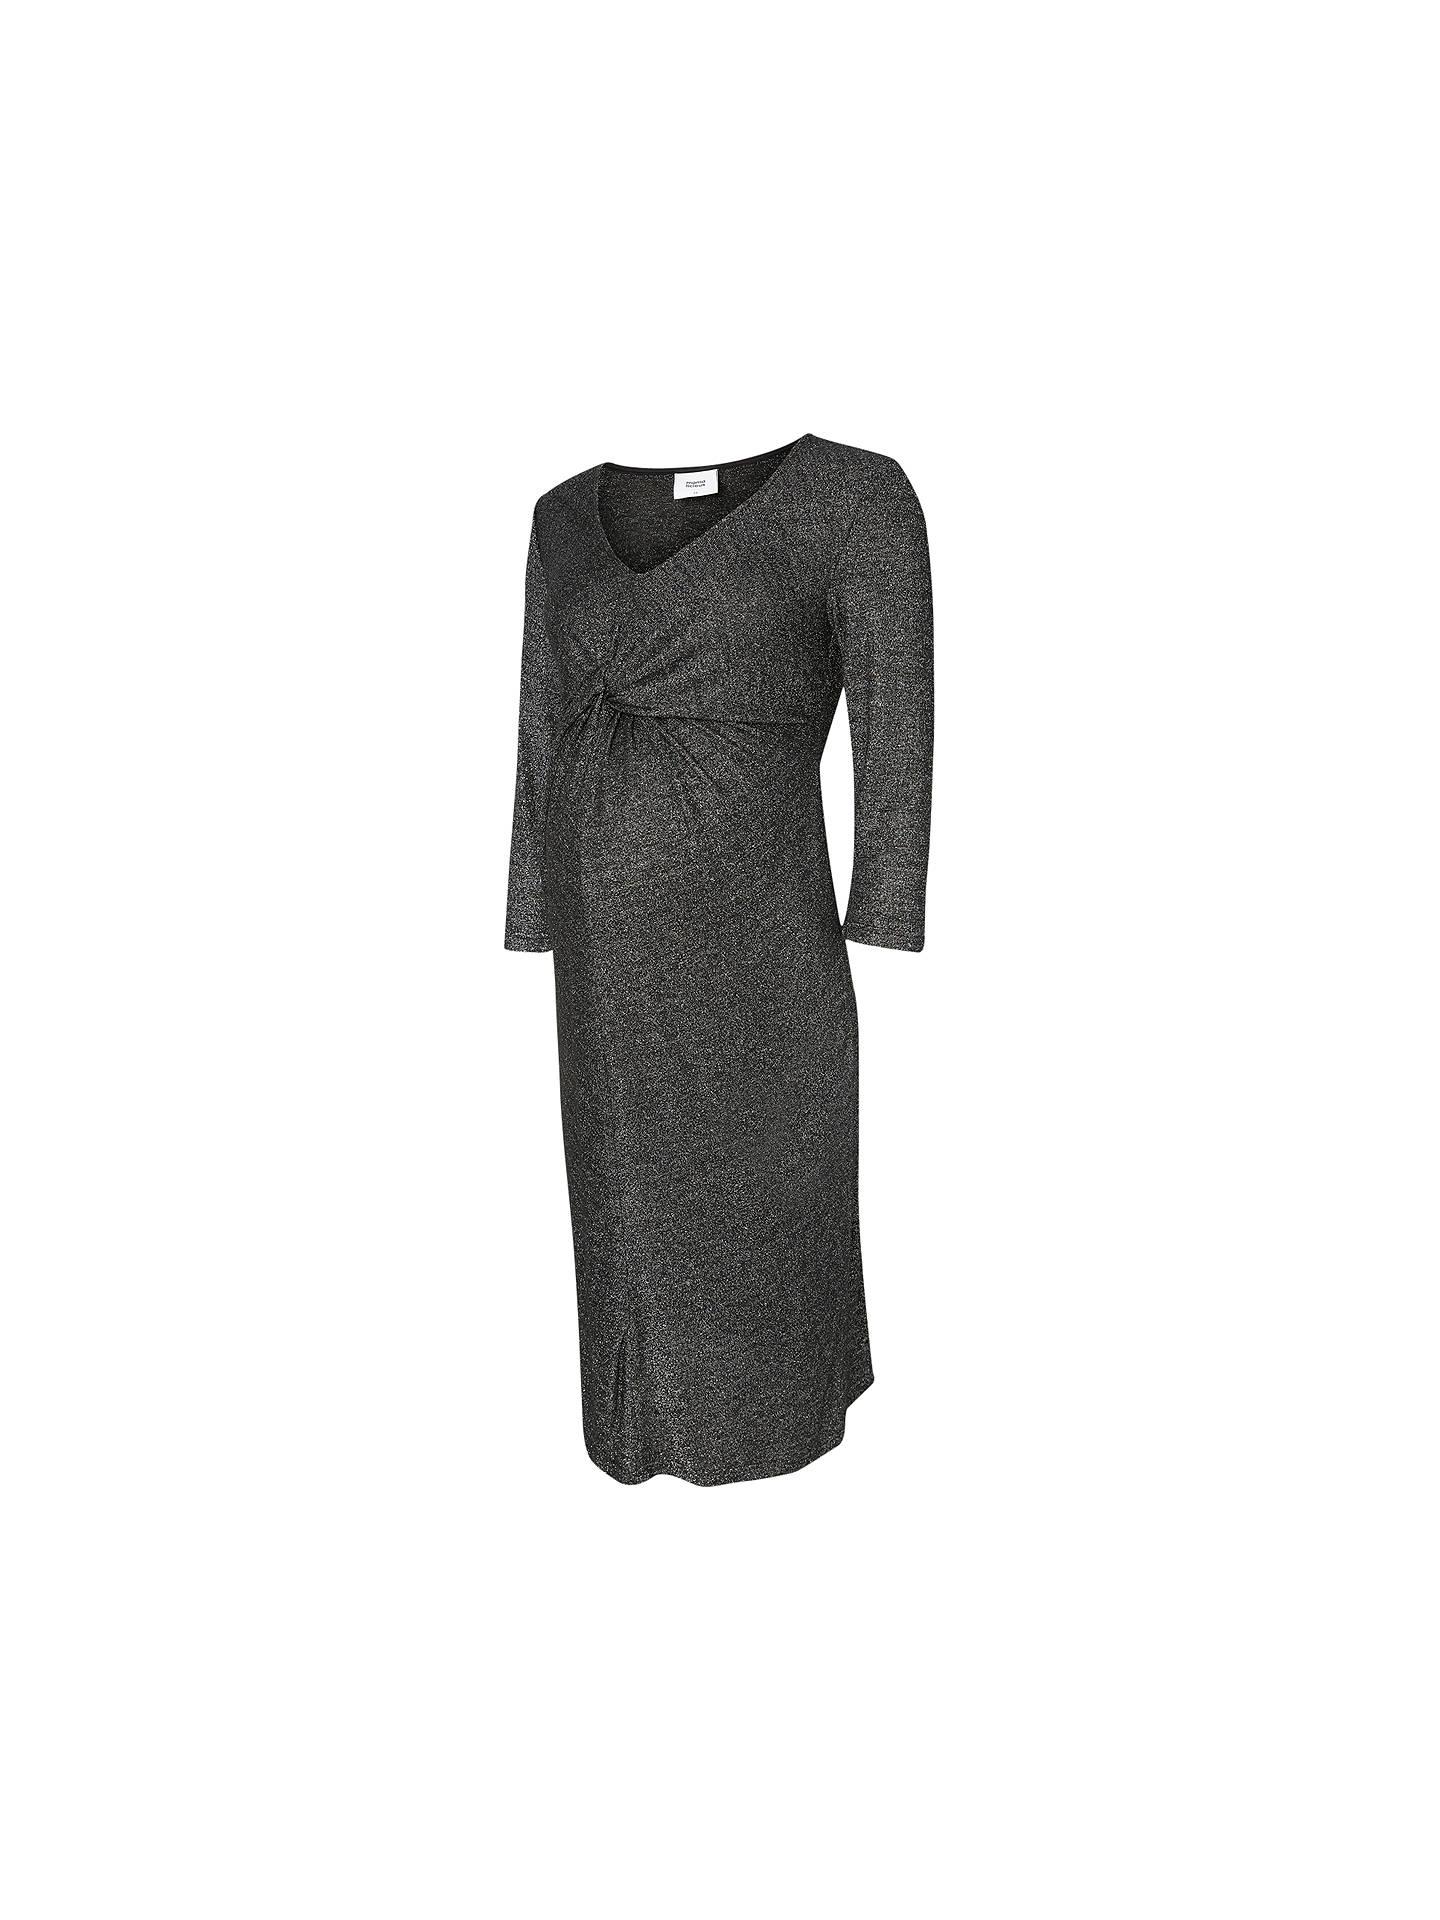 b844da7bea70e Buy Mamalicious Glitter 3/4 Jersey Maternity Dress, Dark Grey, S Online at